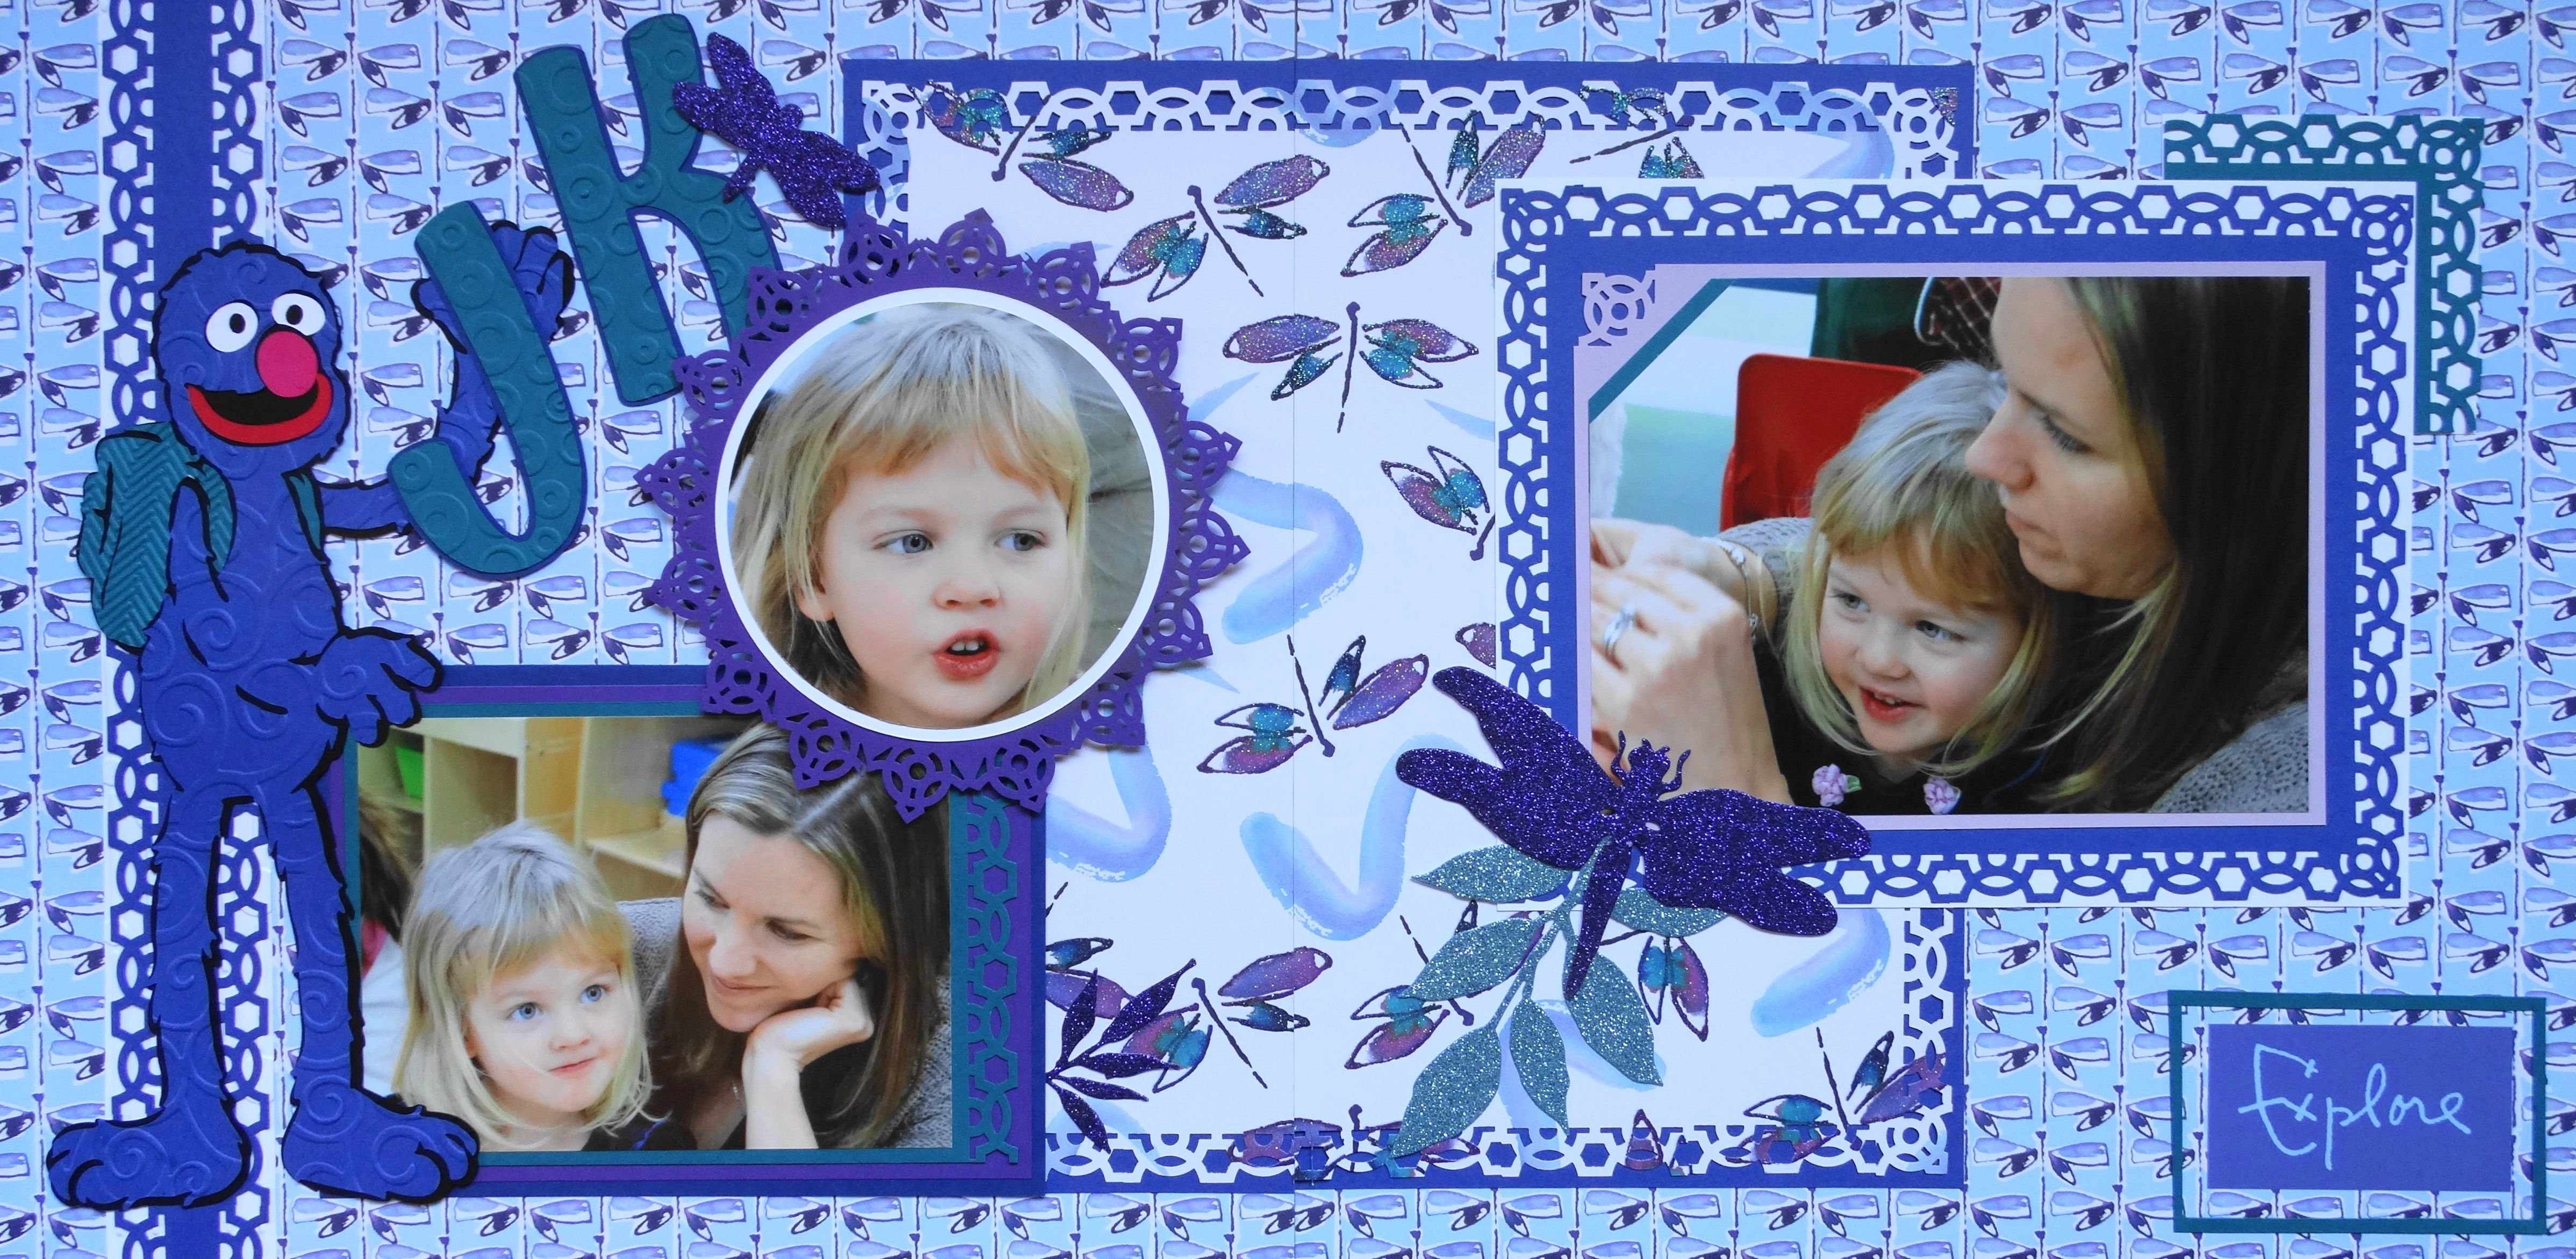 Scrapbook ideas kindergarten - Girl Scrapbook Page Junior Kindergarten Class 2 Page Child Layout With Dragonflies And Sesame